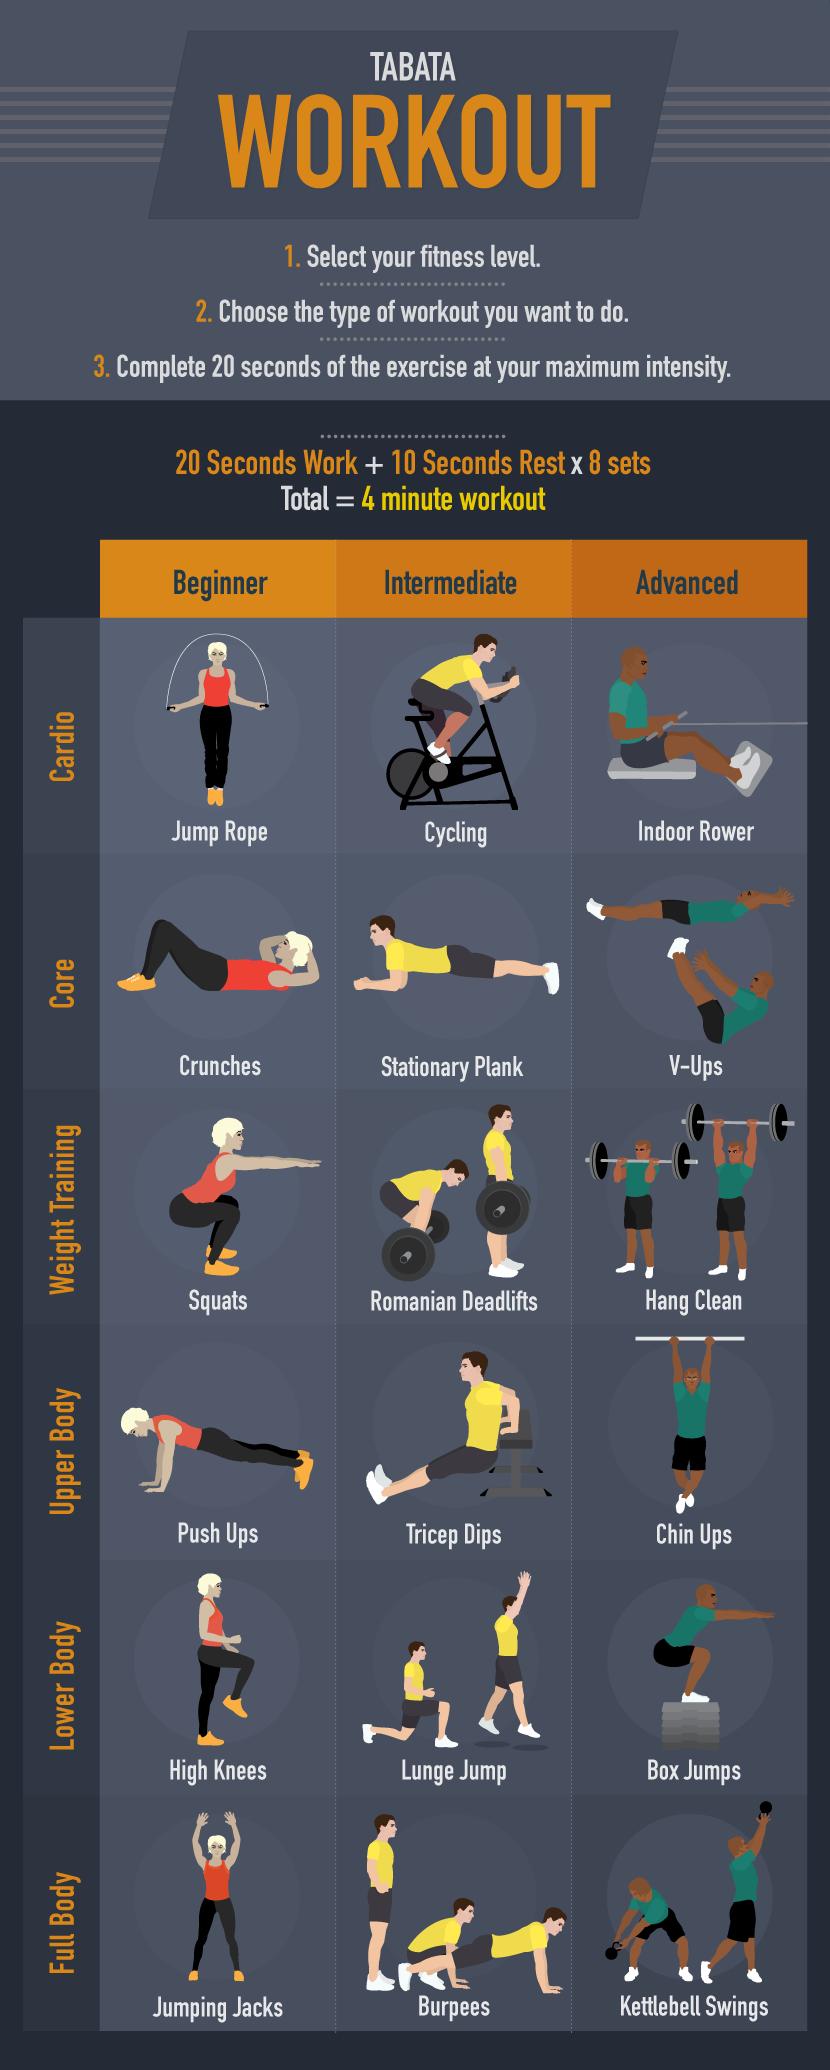 Tabata Workouts